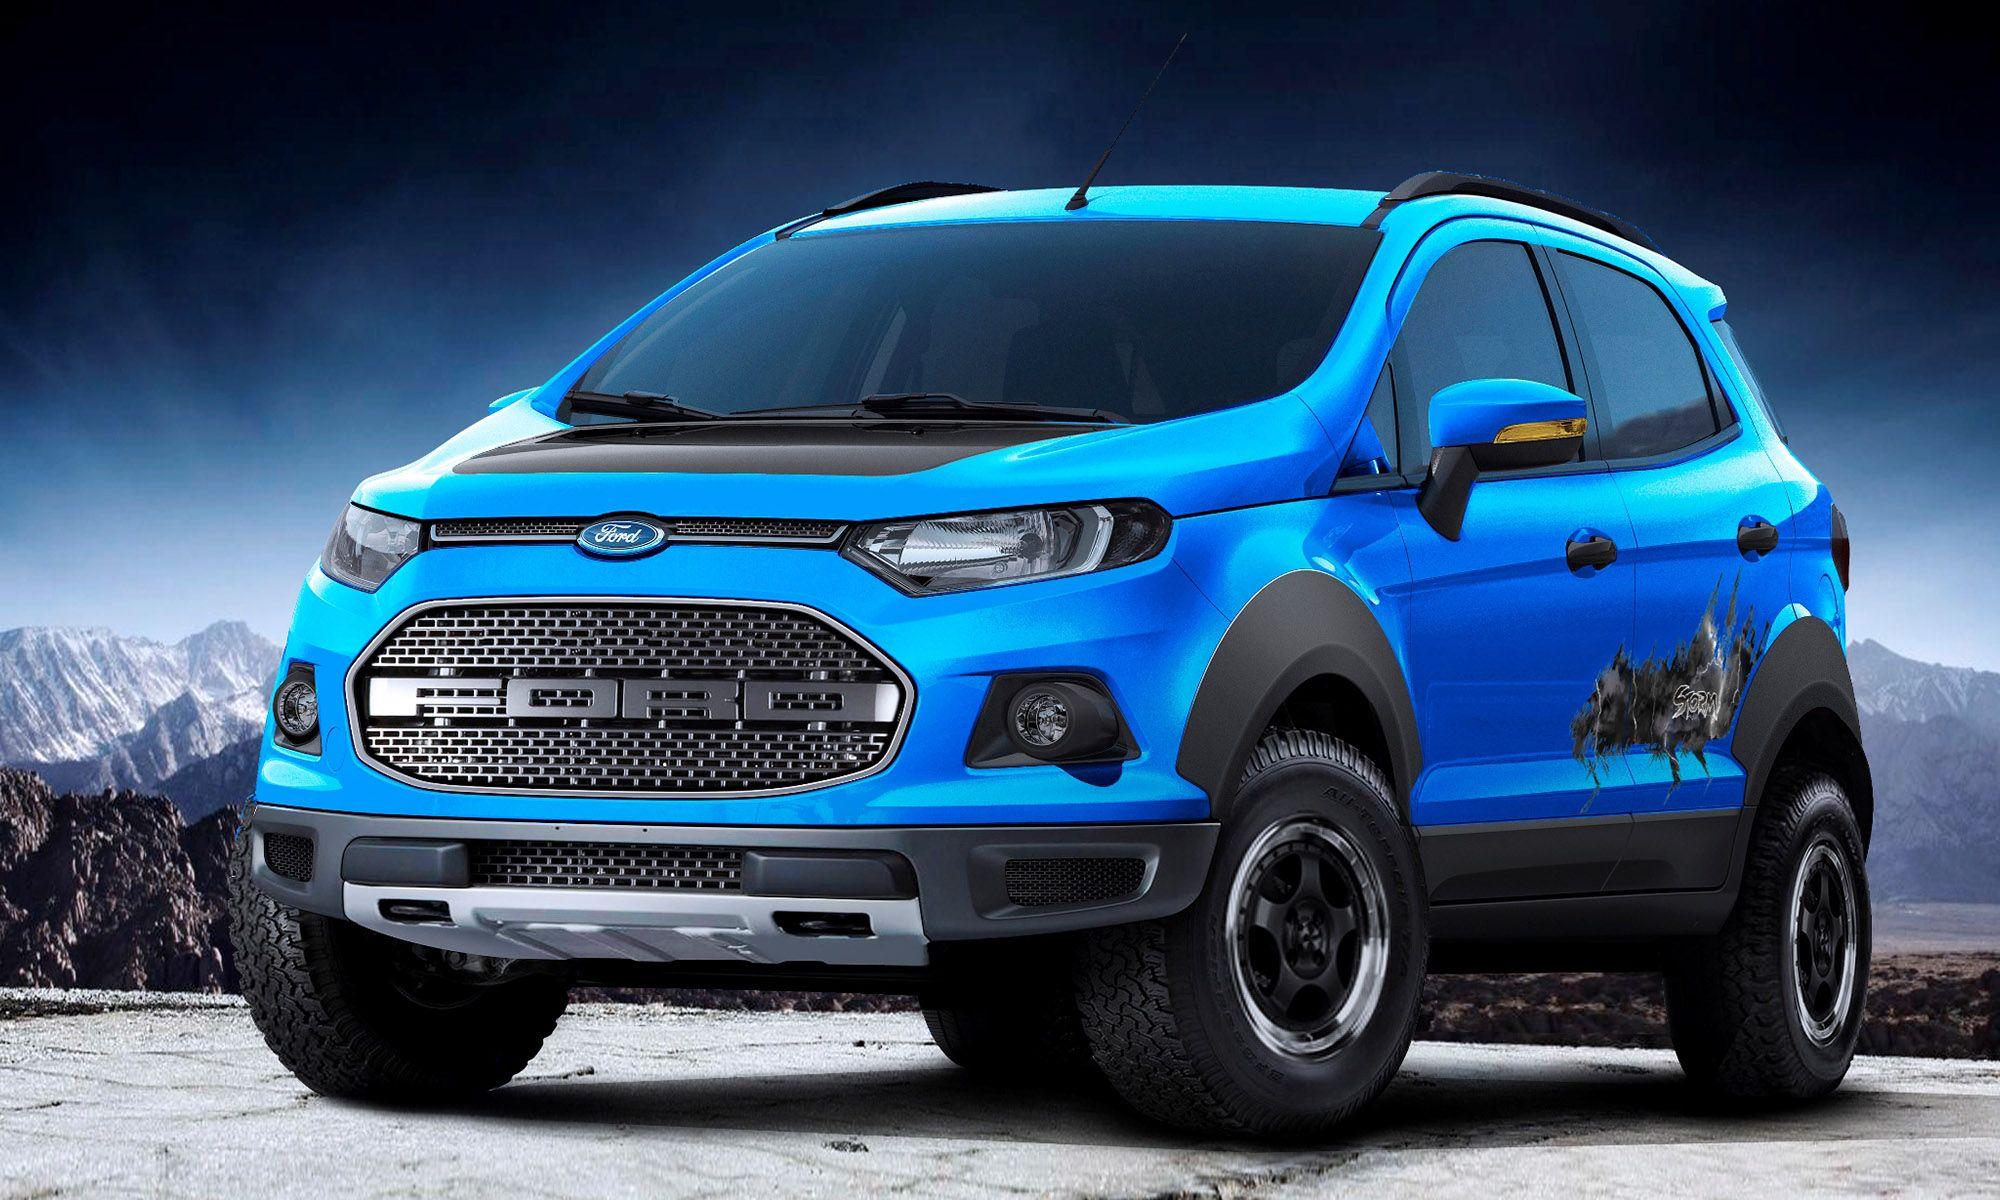 2017 Ford EcoSport Facelift Vs Maruti Vitara Brezza Ford ecosport photos wallpapers